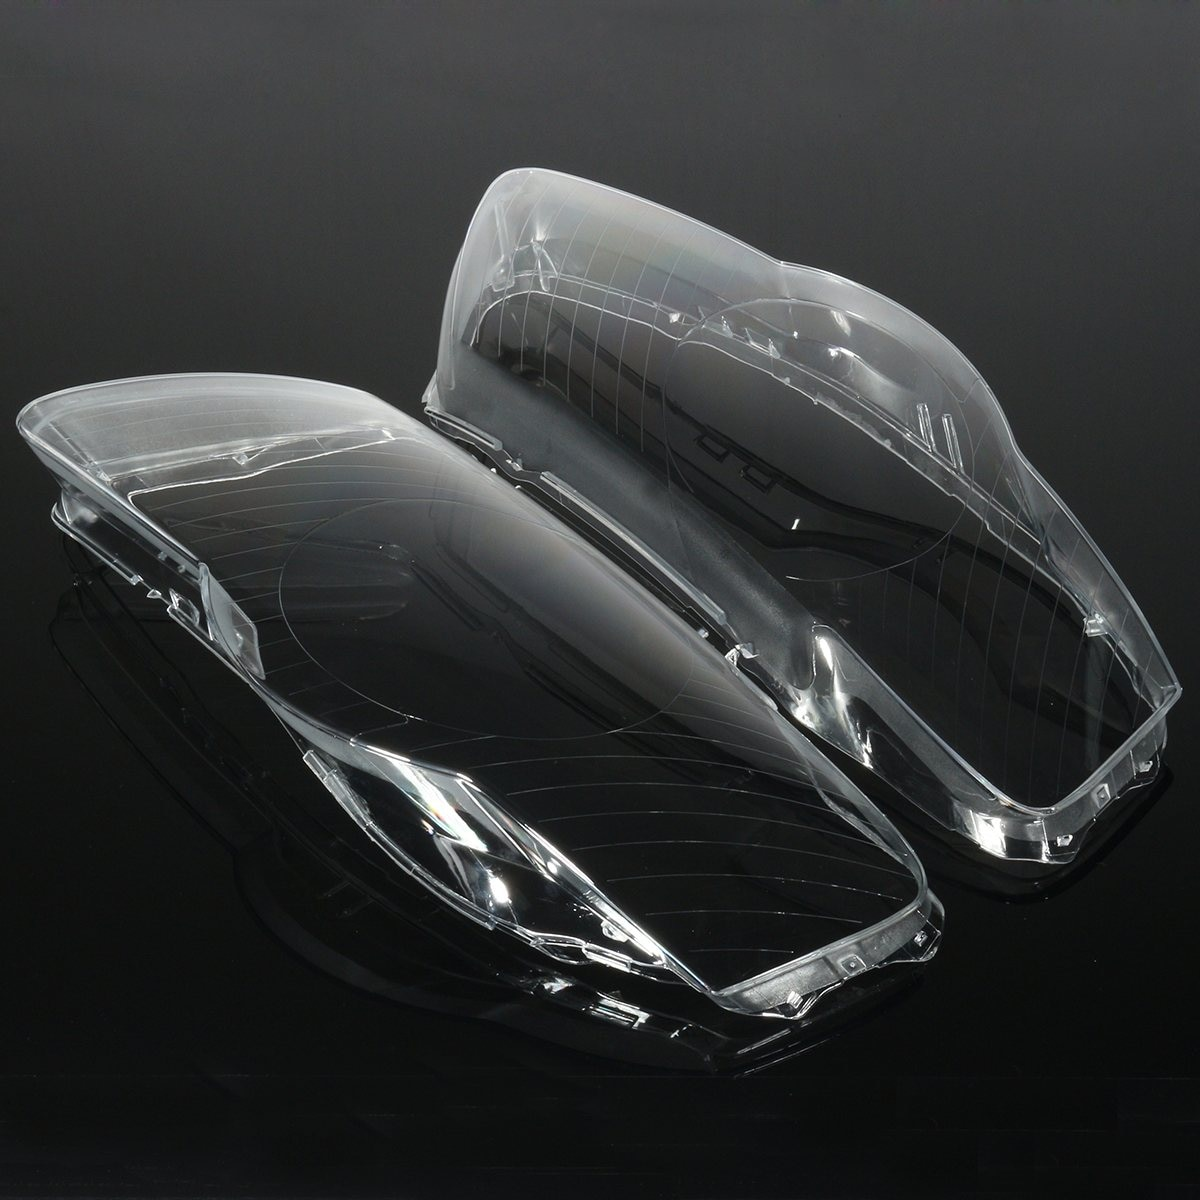 Пара автомобильных фар, водонепроницаемые яркие прозрачные линзы для фар Volkswagen VW Passat B6 bi-Xenon R36